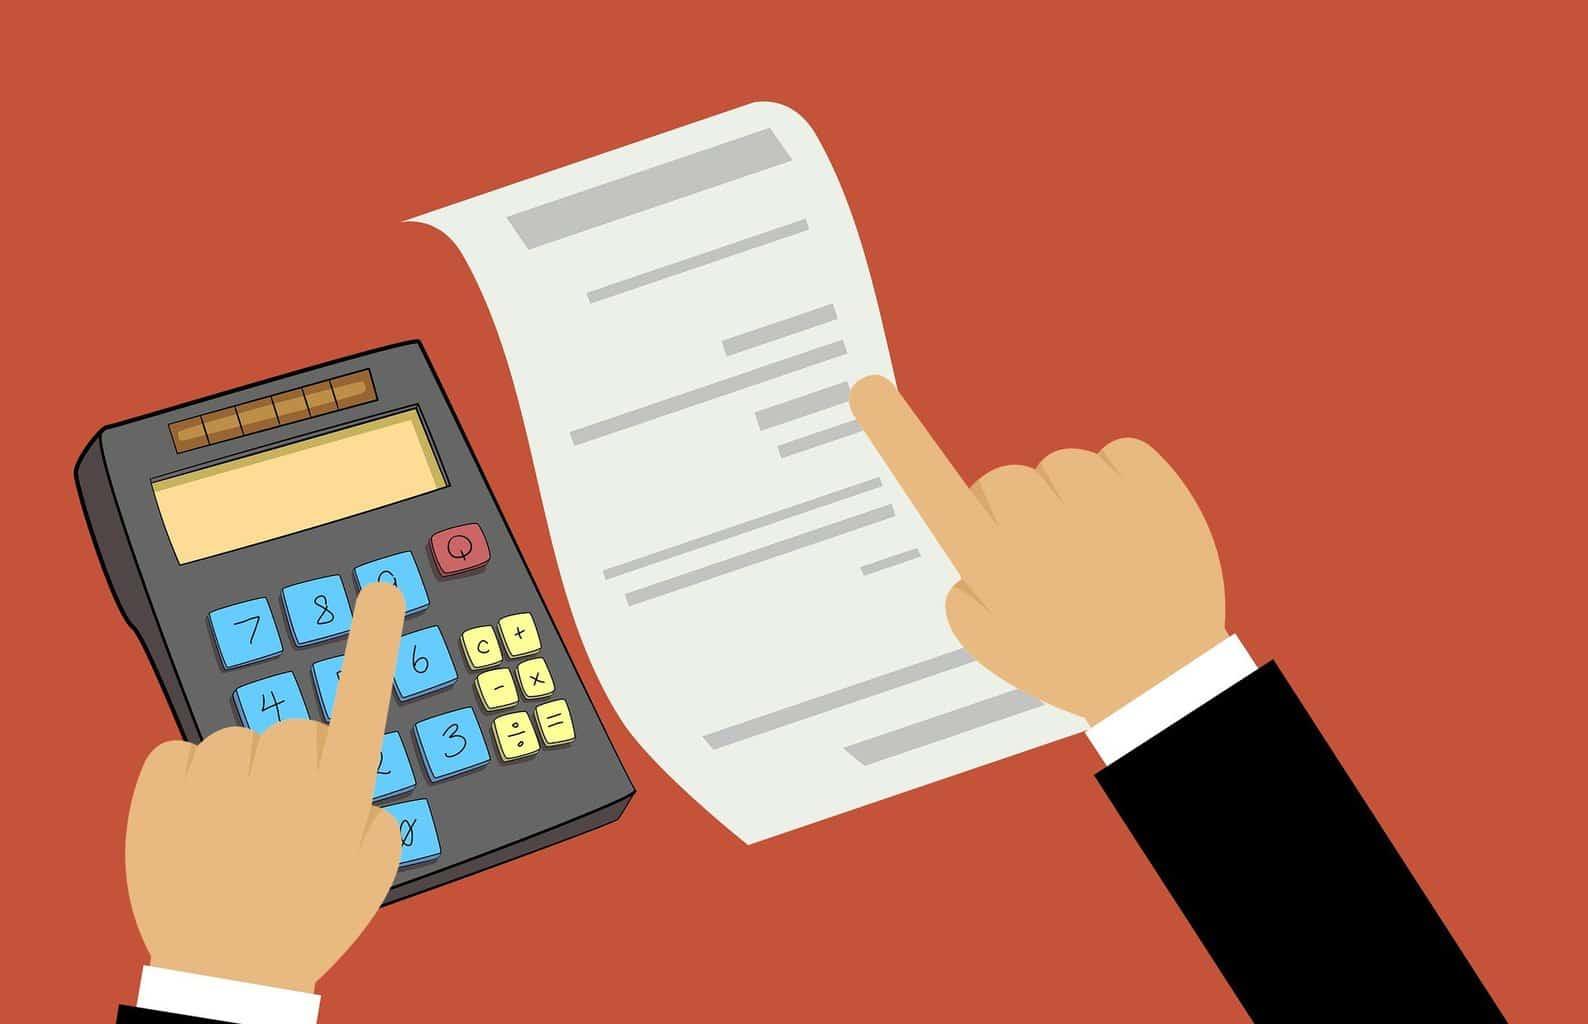 Betale kredittkortregningen